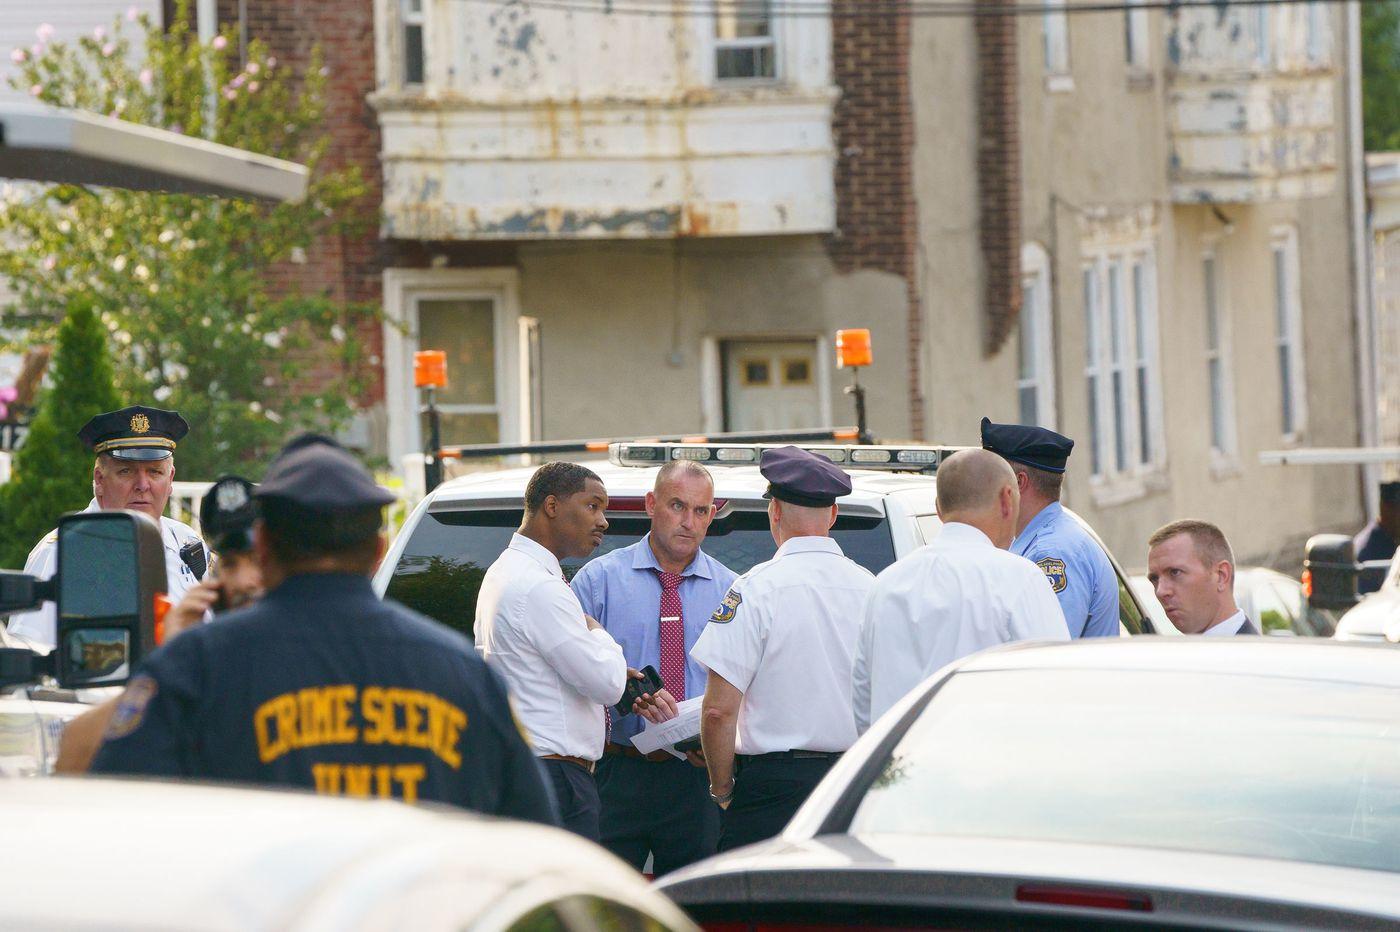 Philadelphia police officer shot in face serving warrant in Germantown